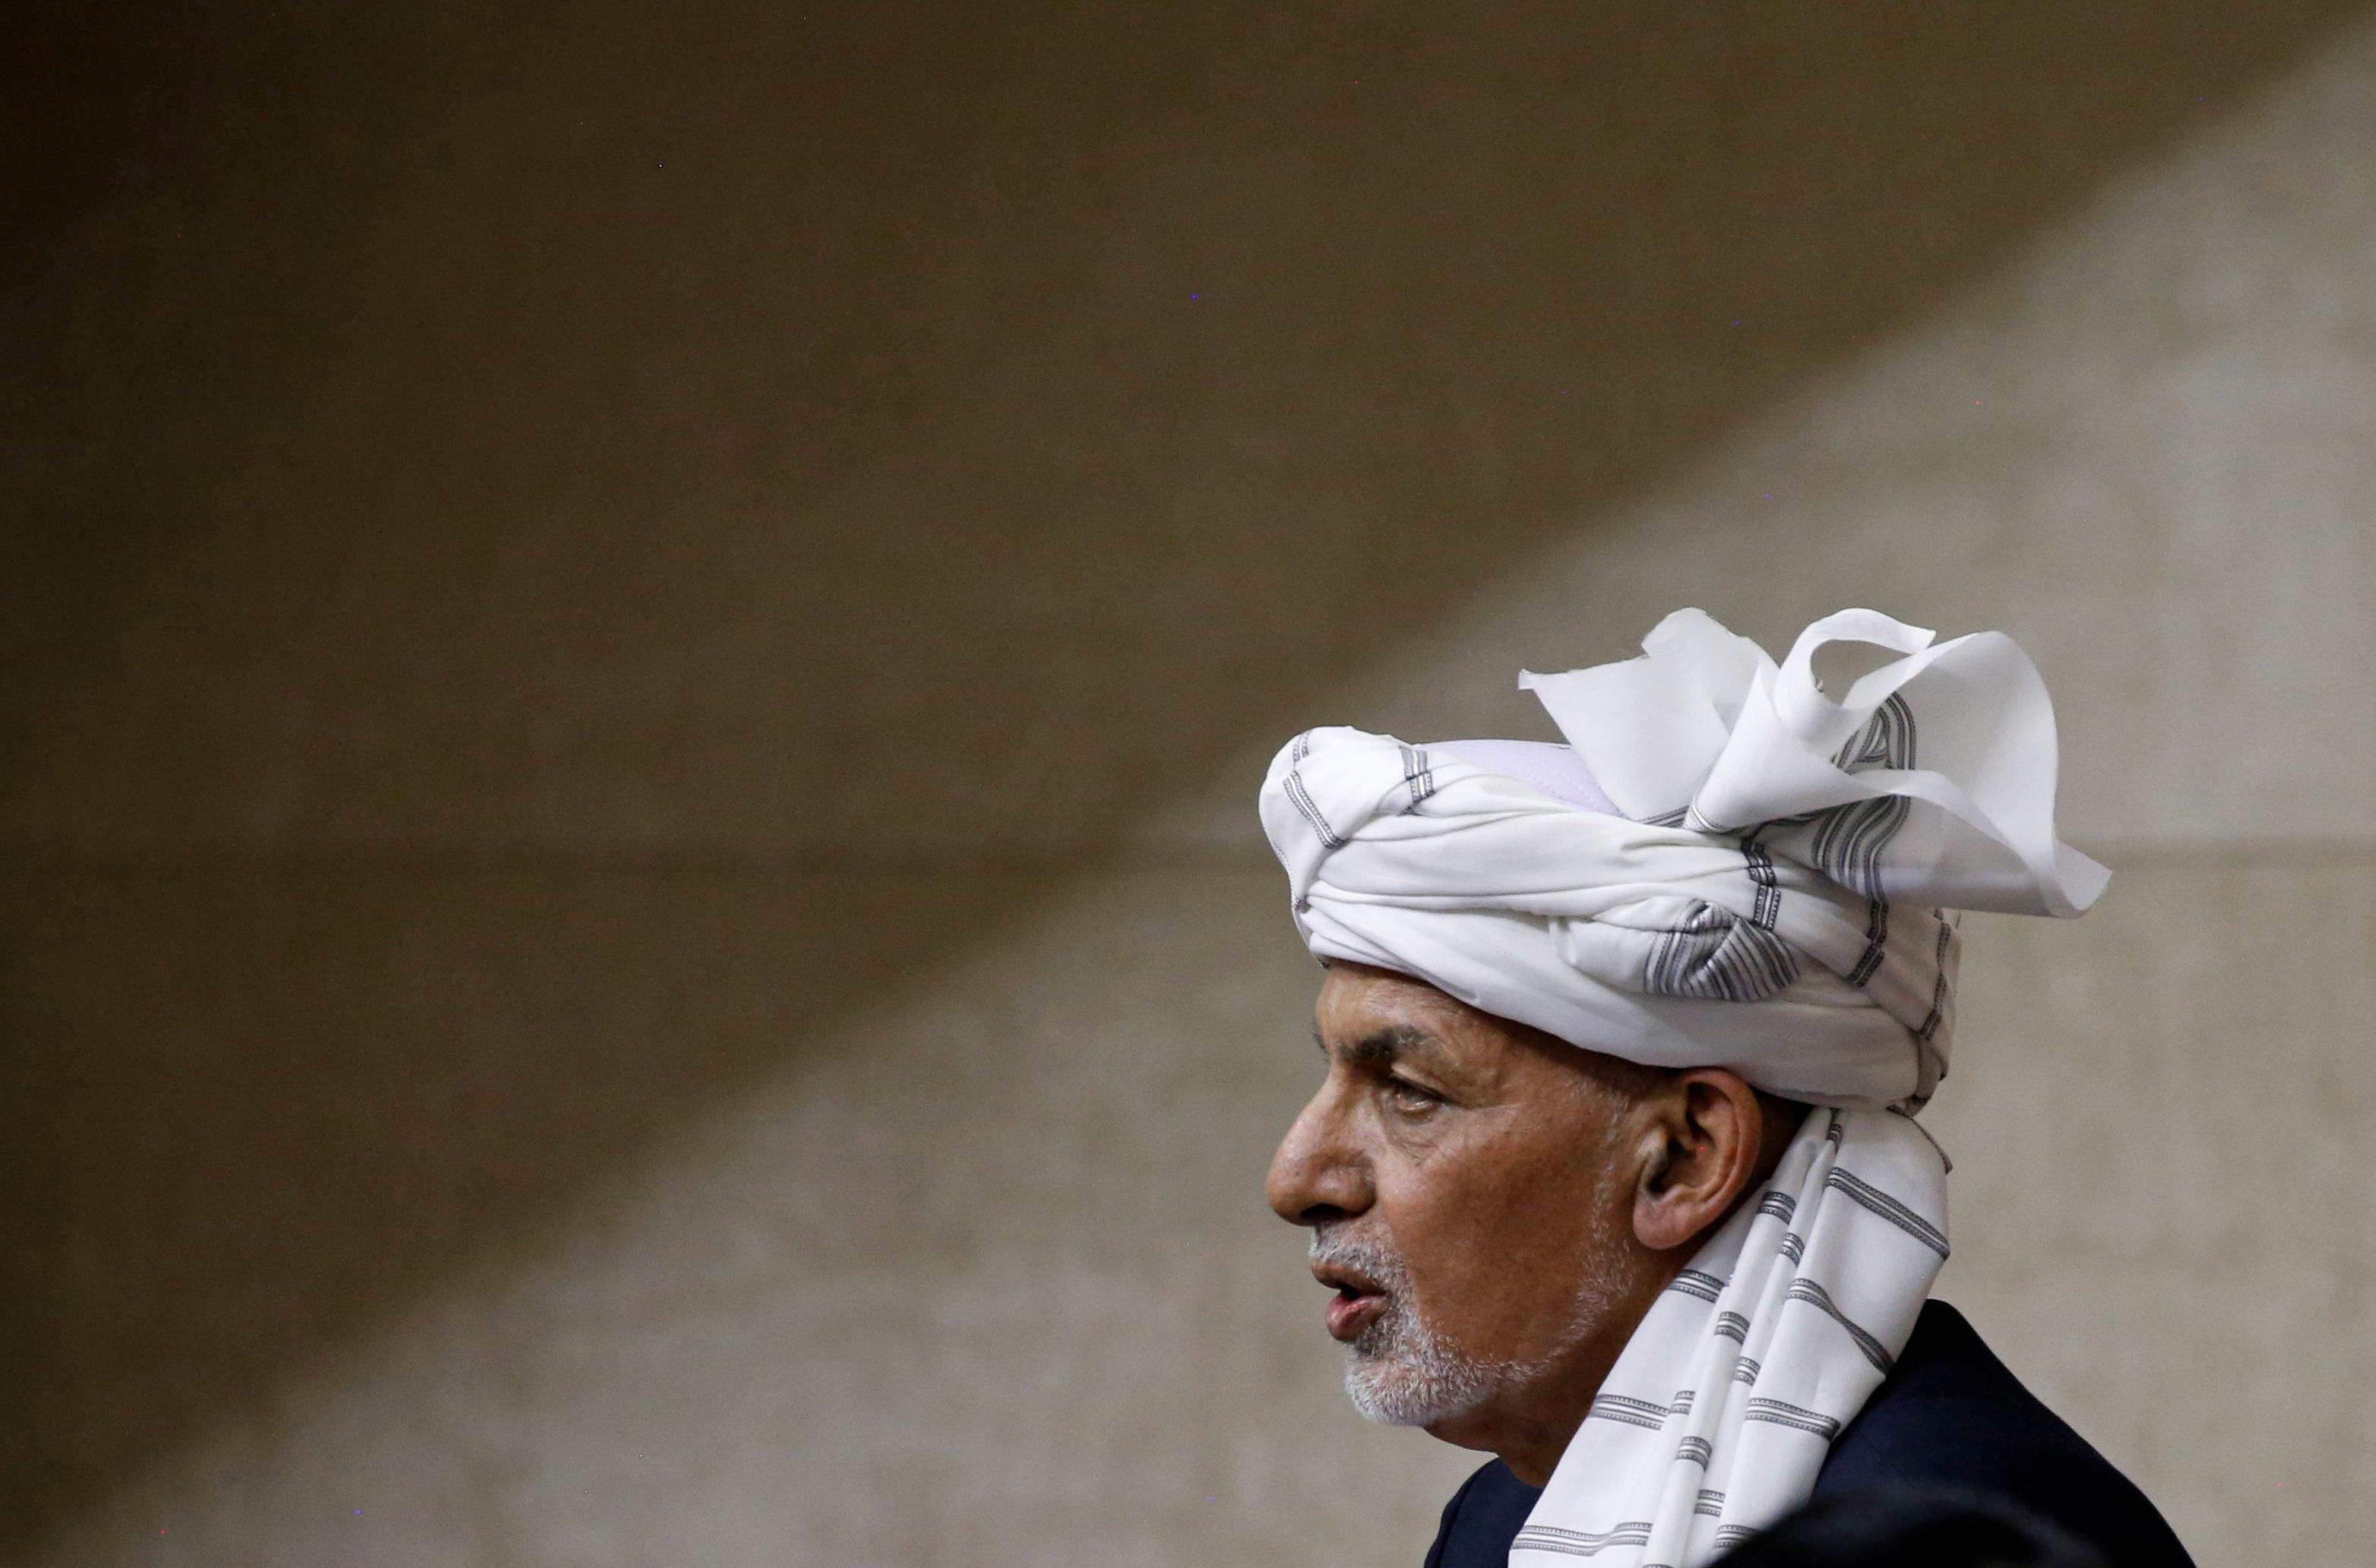 Afghan President Ashraf Ghani speaks at the parliament in Kabul, Afghanistan August 2, 2021. REUTERS/Stringer